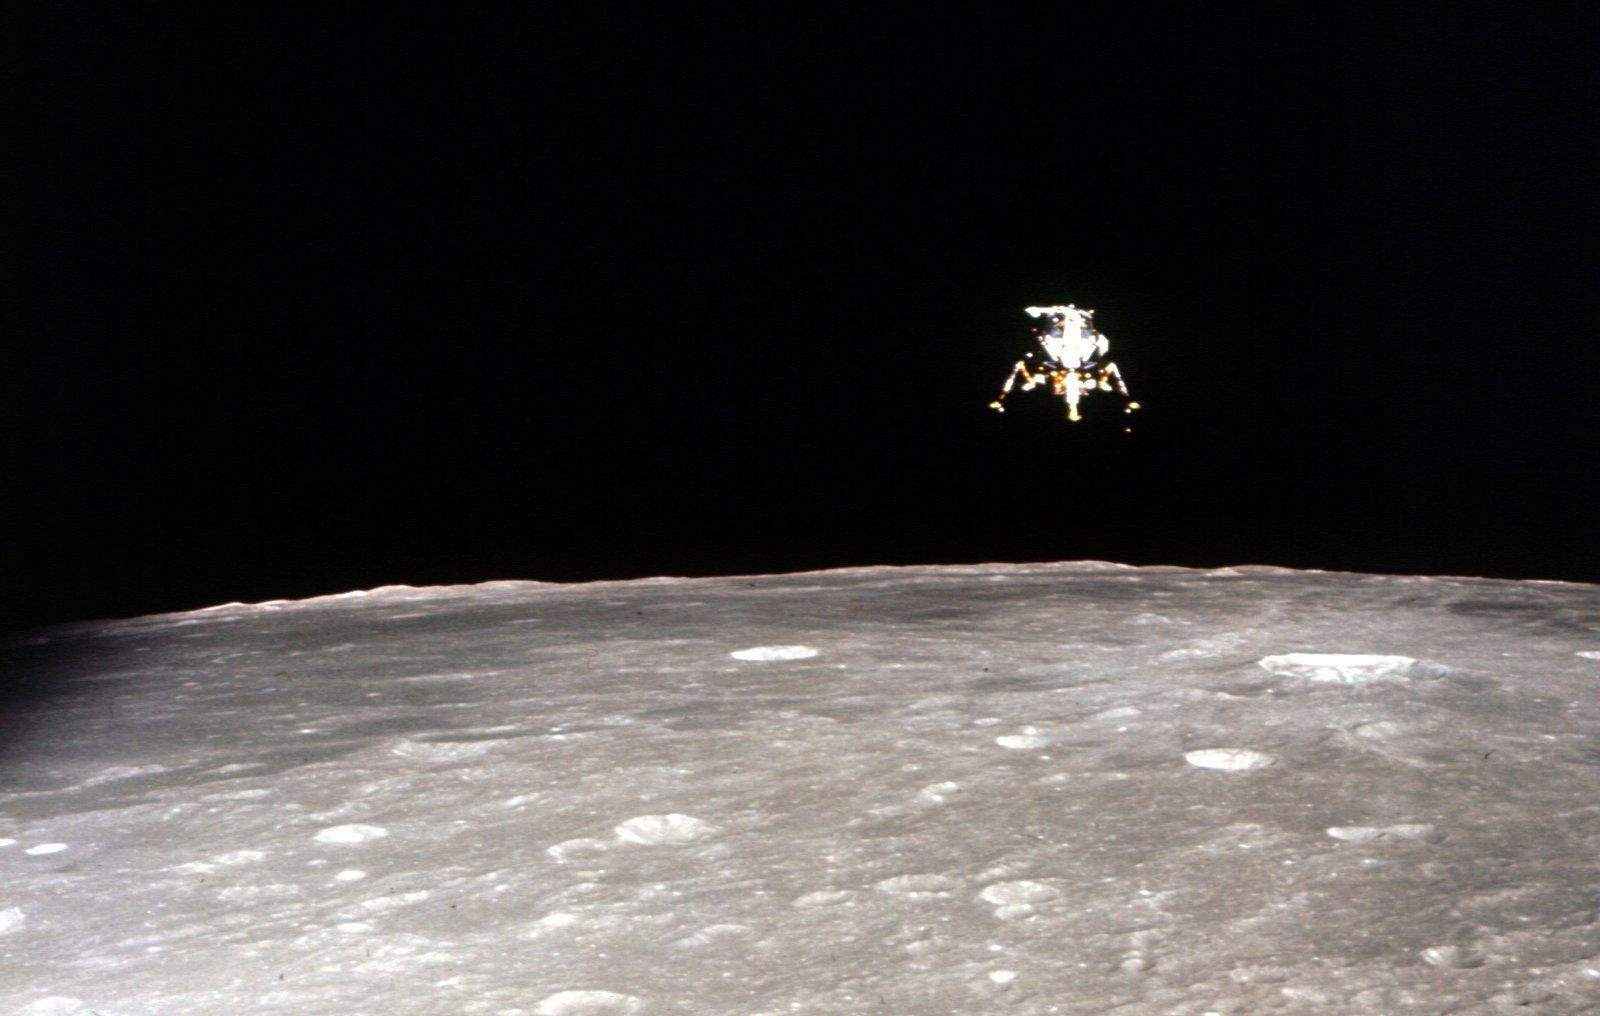 Landefähre von Apollo 12